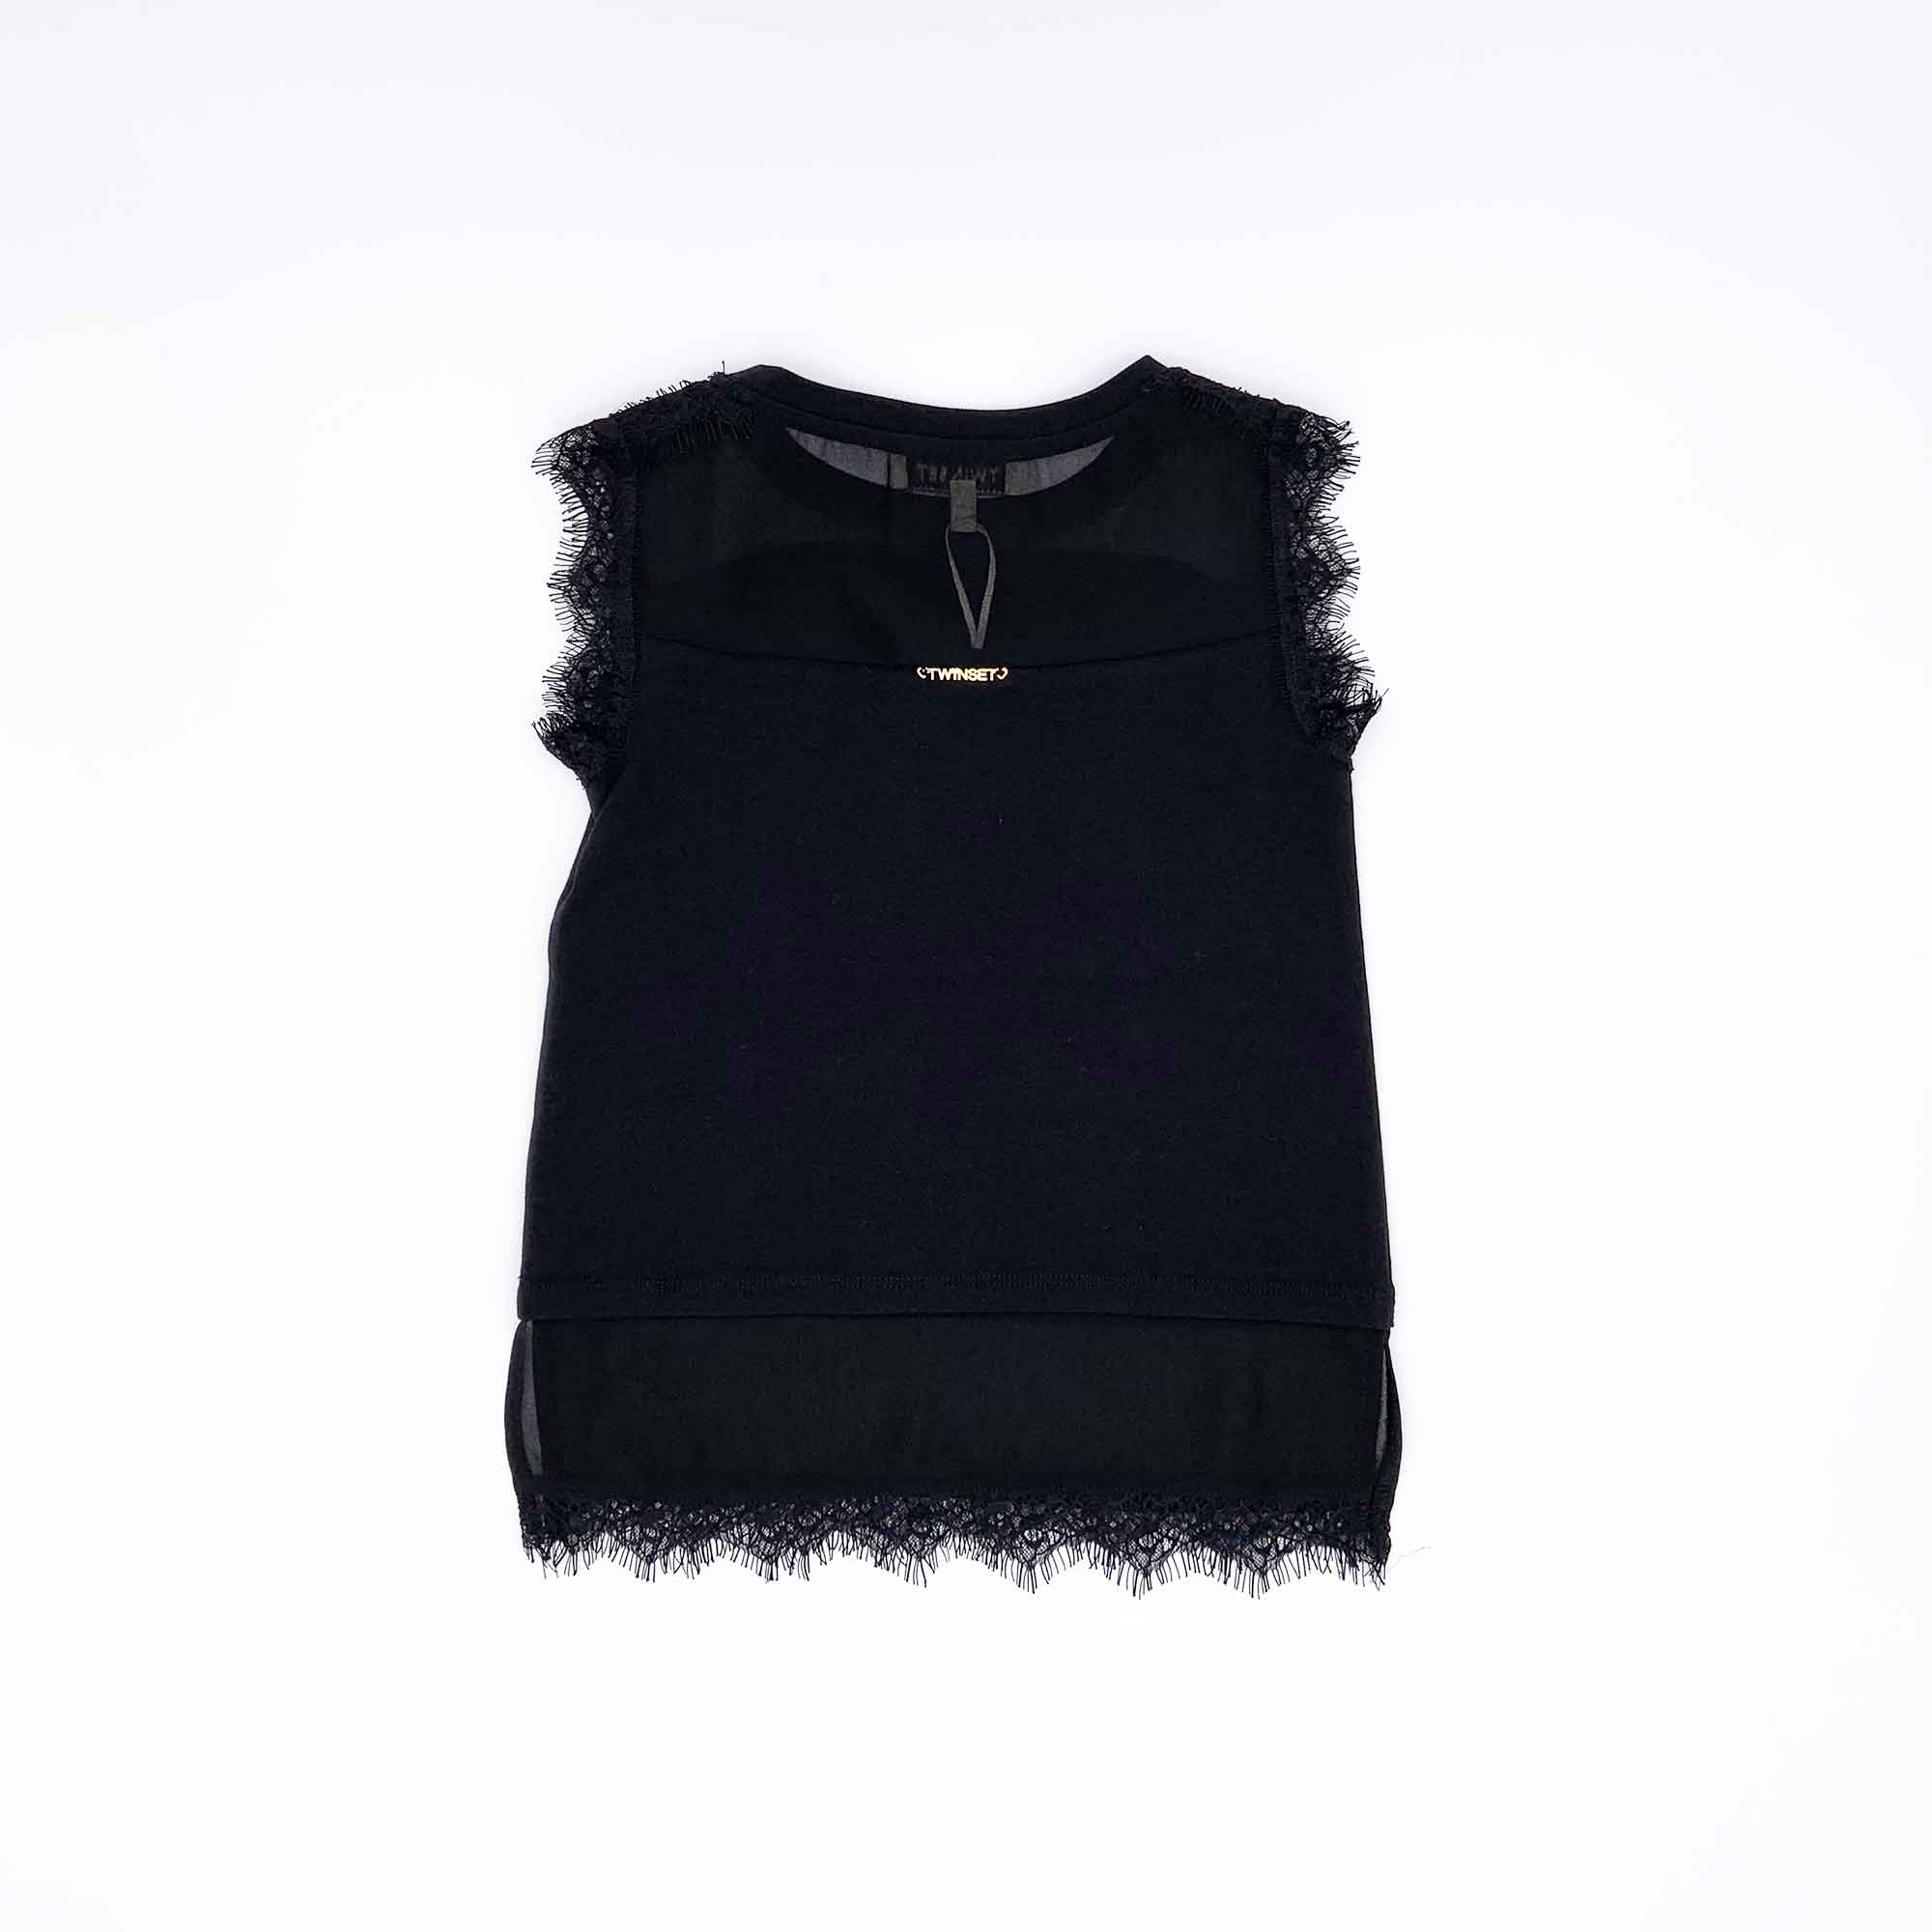 Blusa doppio tessuto - Nero